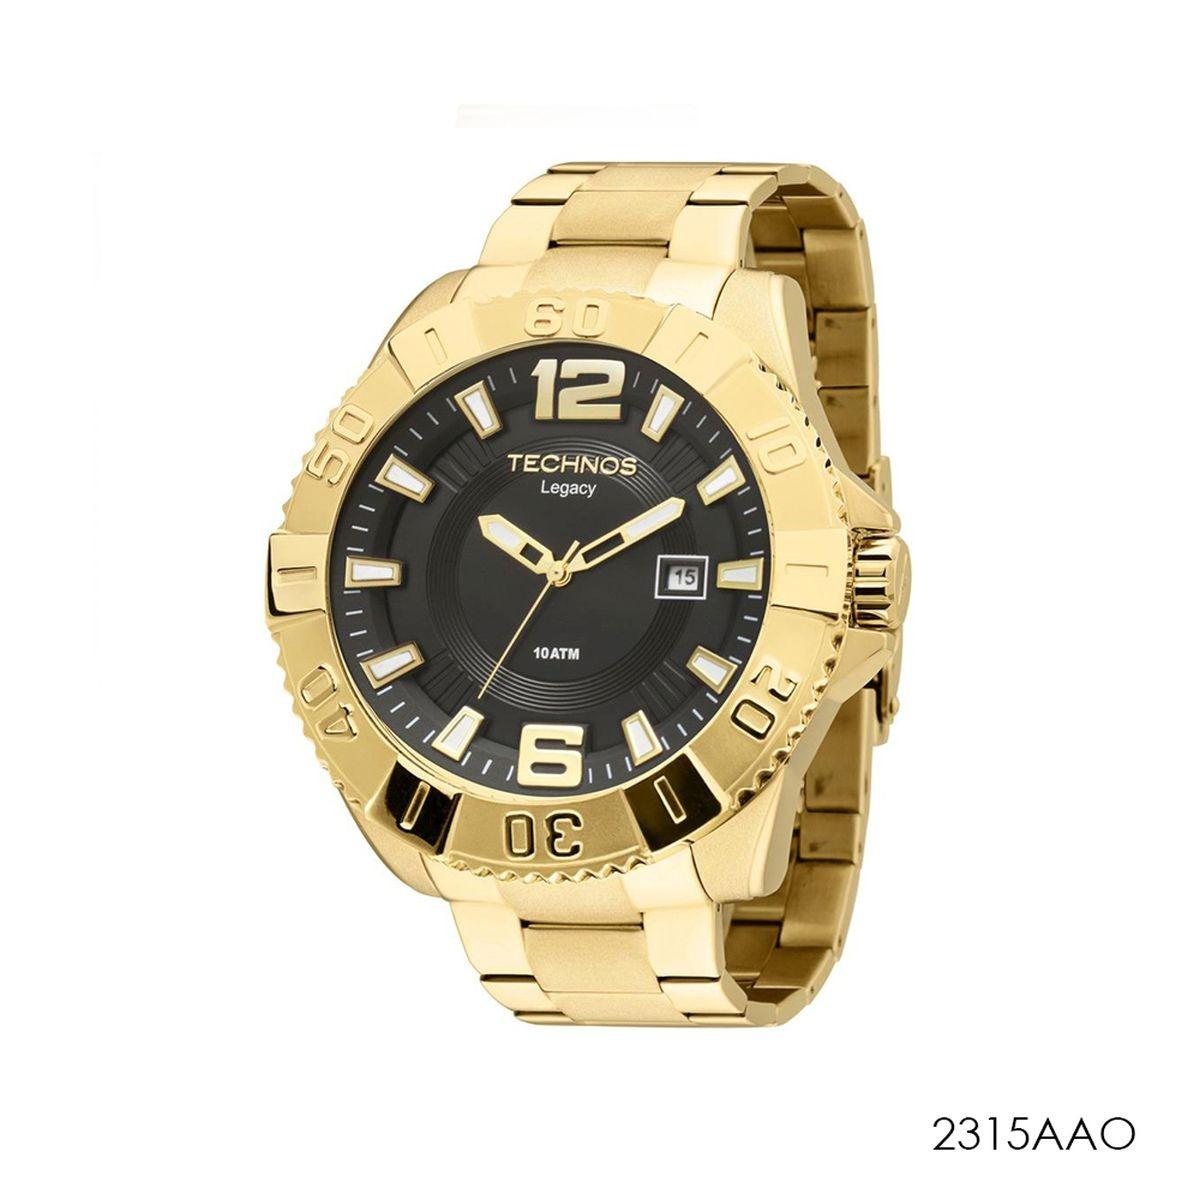 8ab70f0a417 relógio technos masculino classic legacy 2315aao. Carregando zoom.